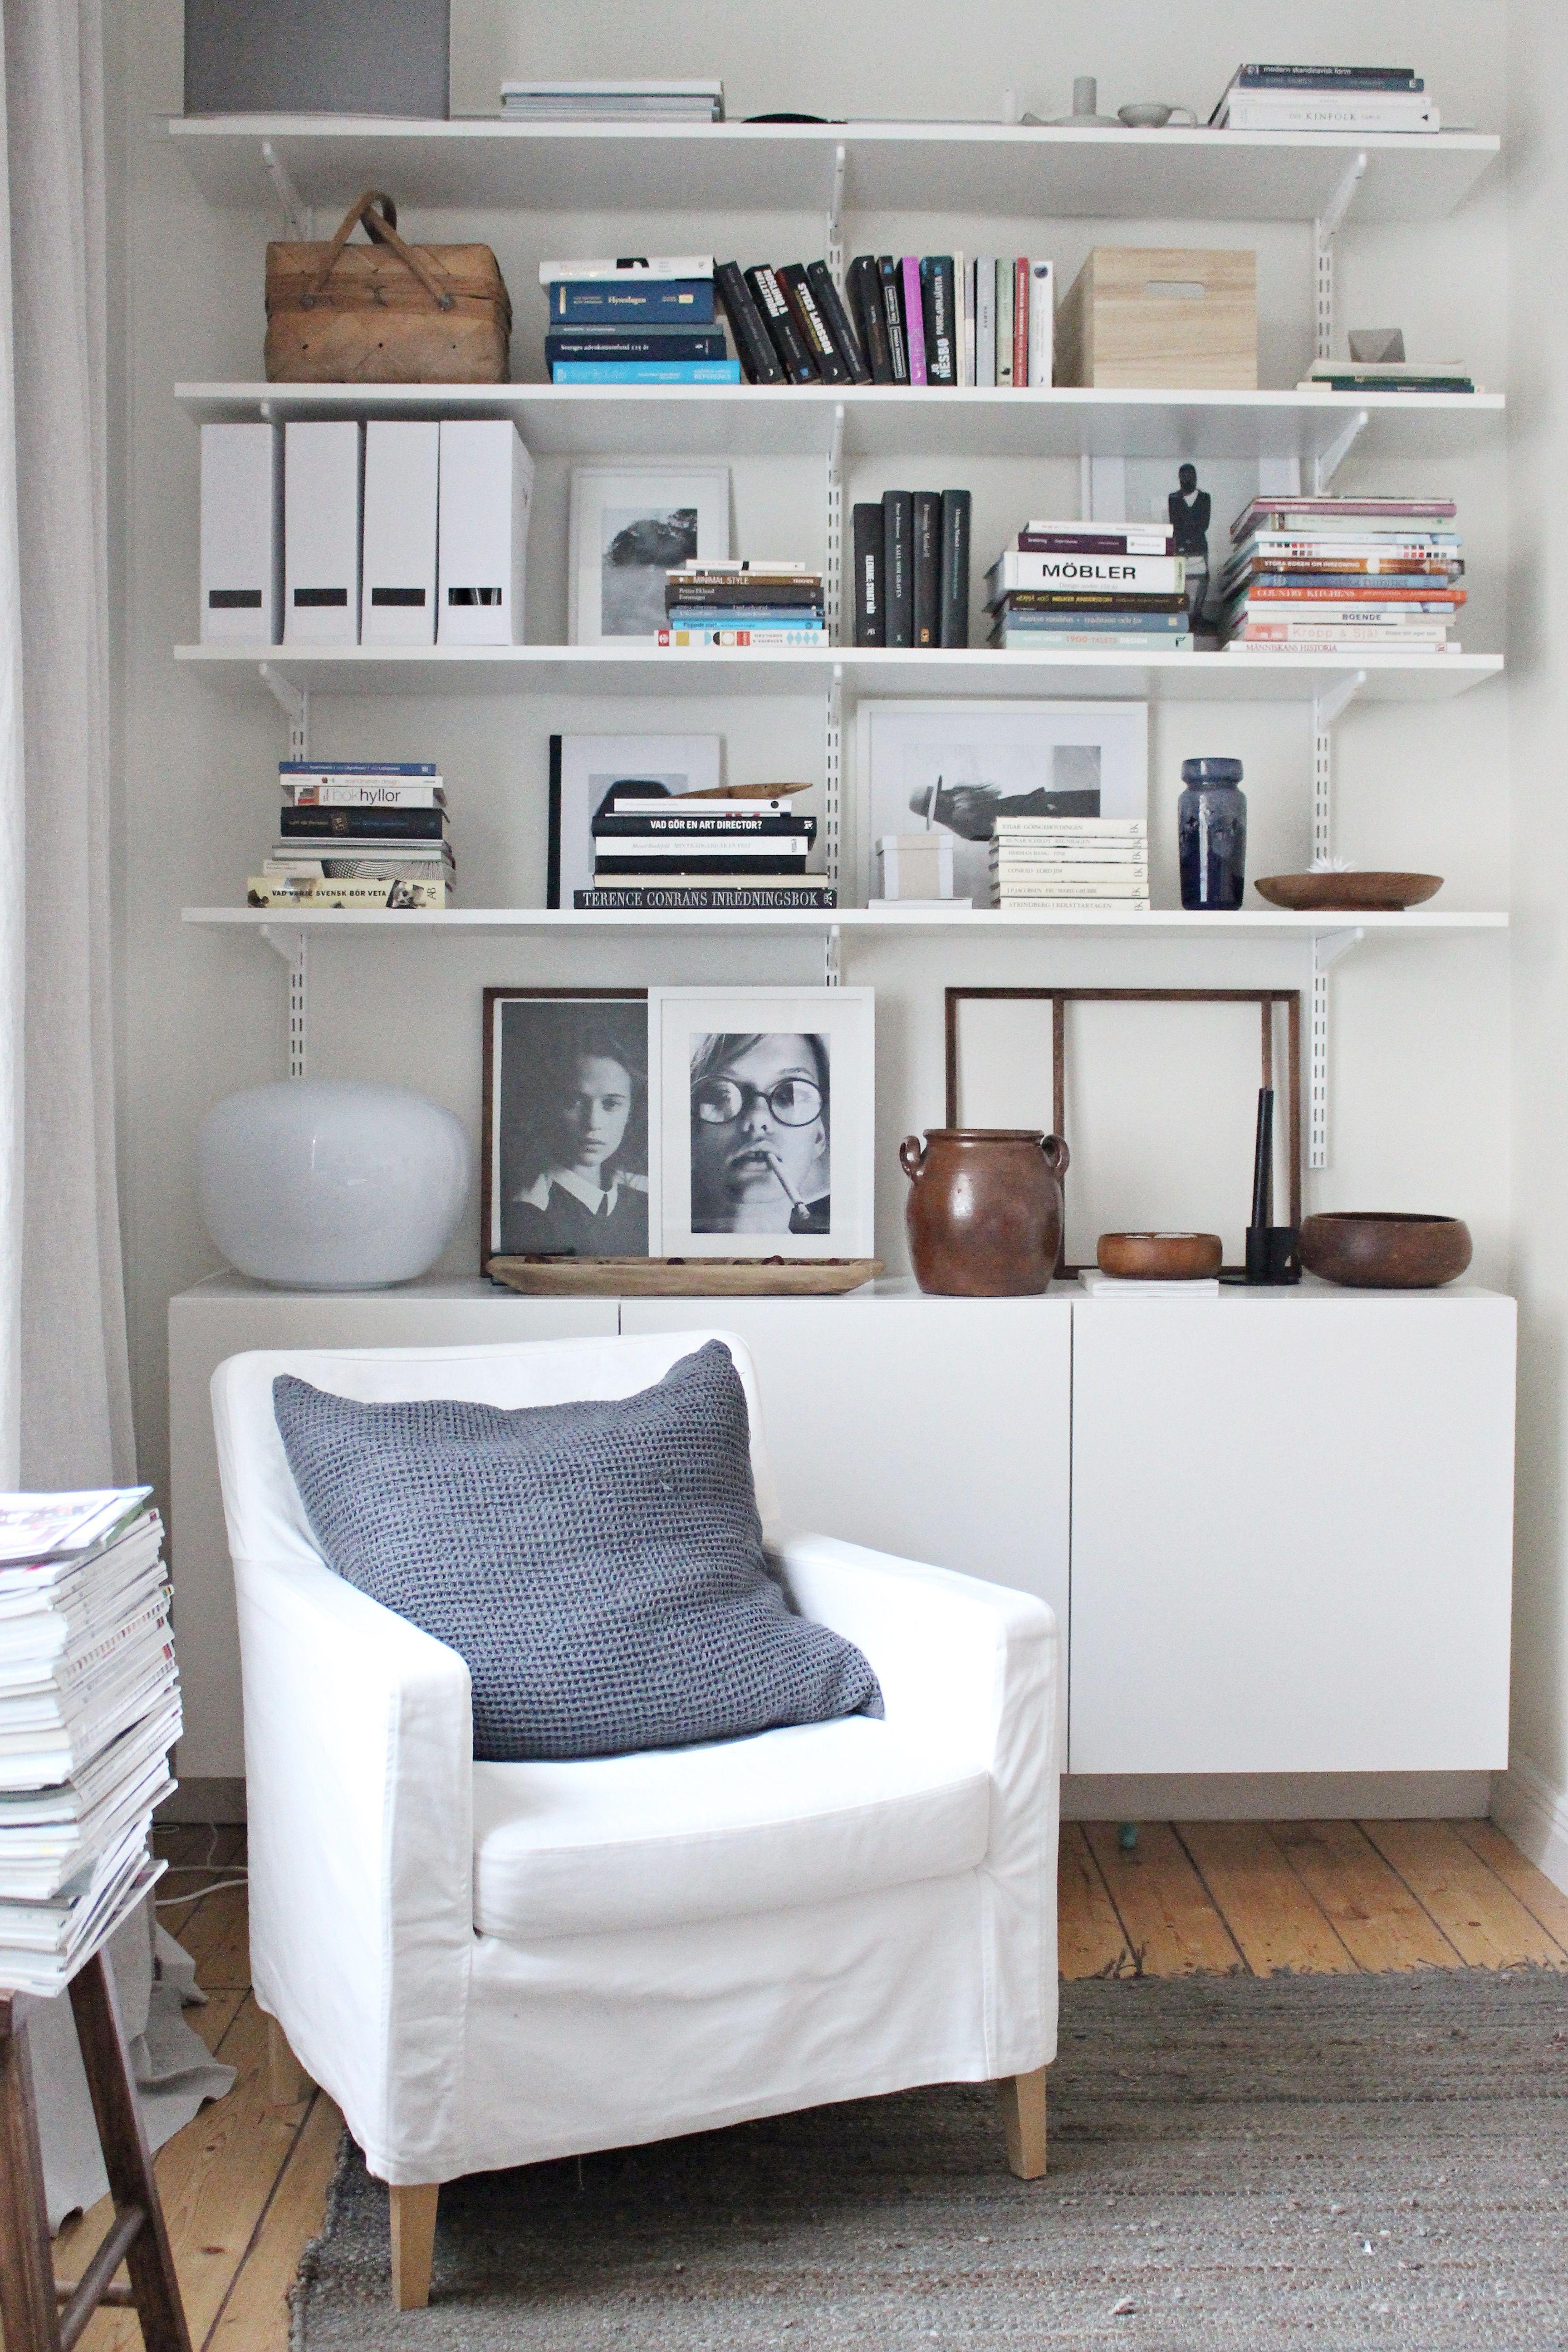 Ikea cabinets, ikea and shelves on pinterest